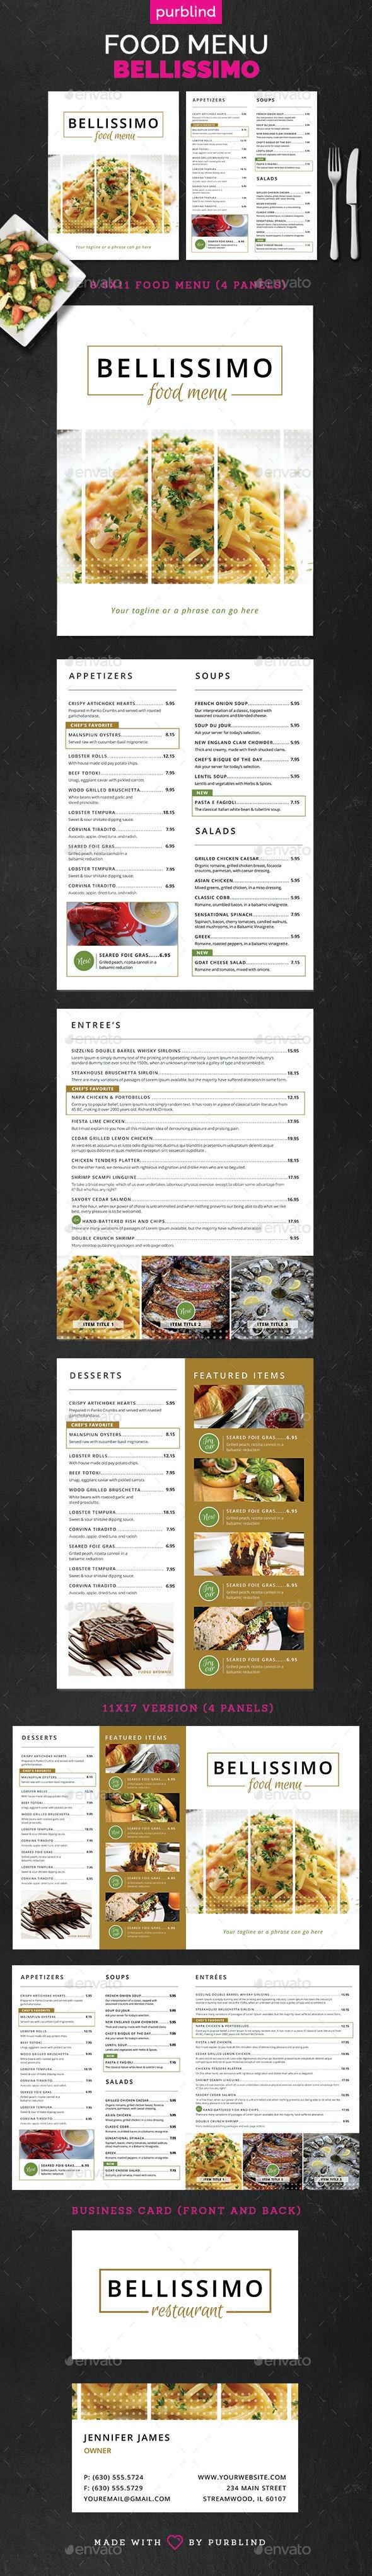 Restaurant Menu Set - Bellissimo - Food Menus Print Templates